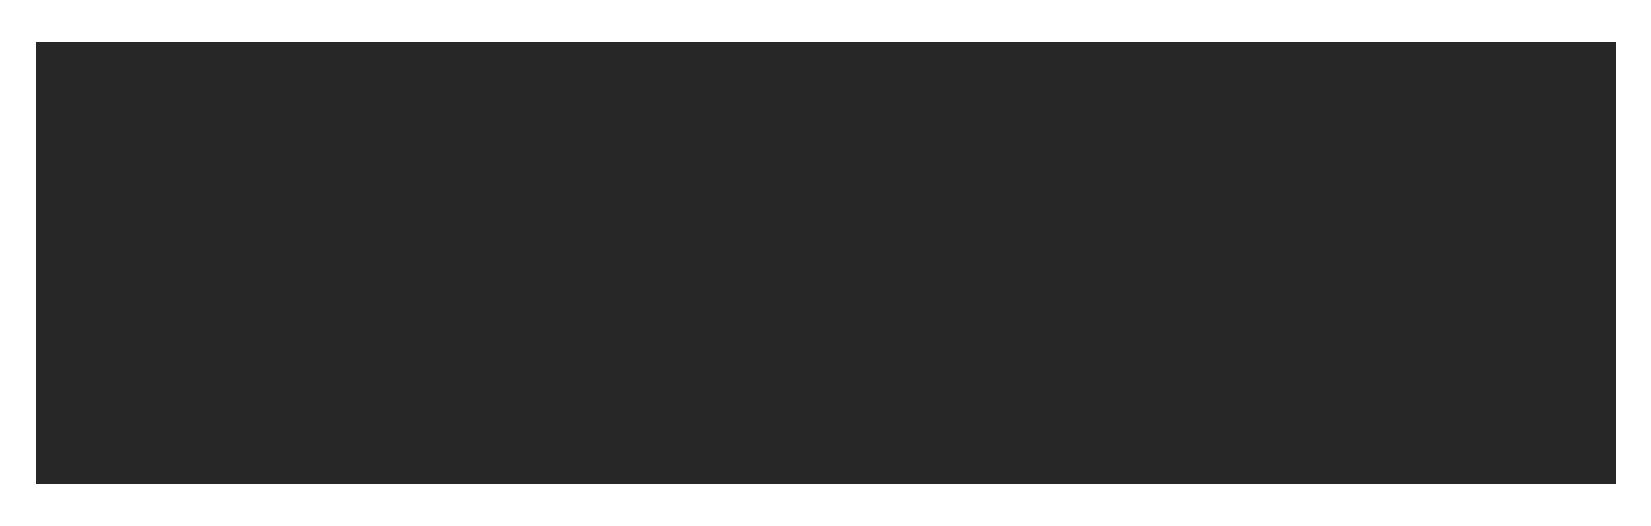 Efn logo final 05